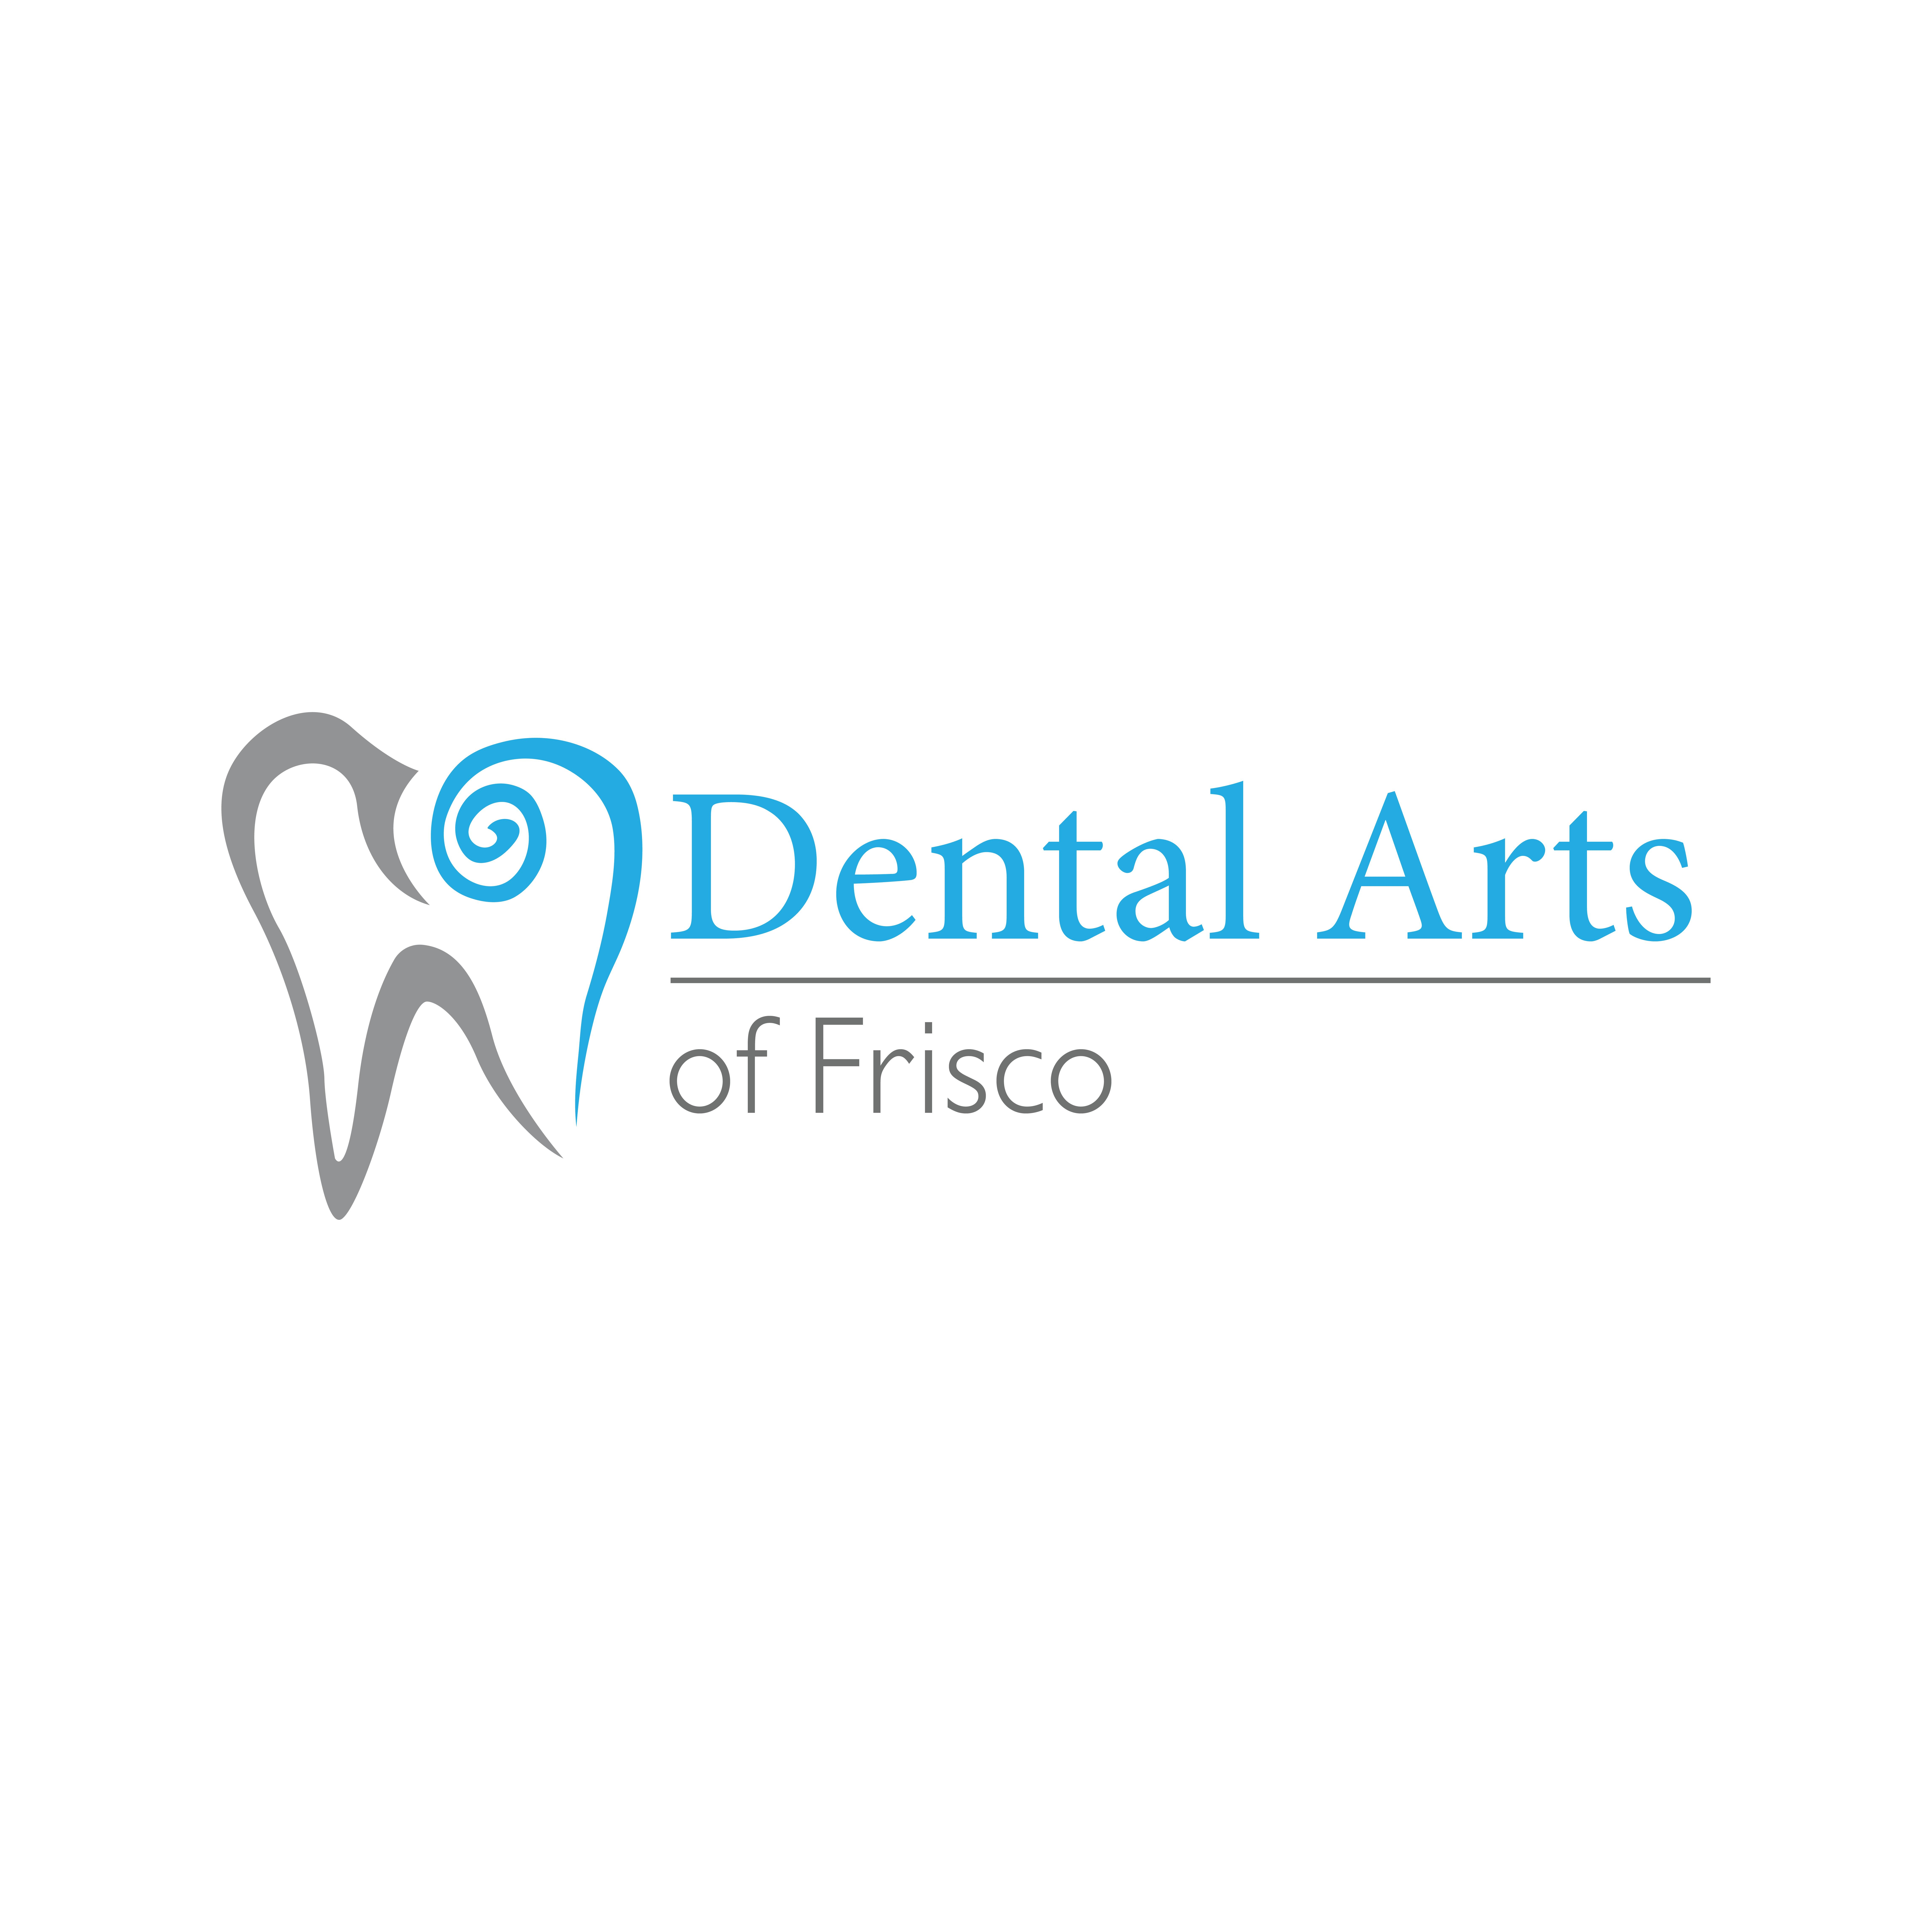 Dental Arts of Frisco